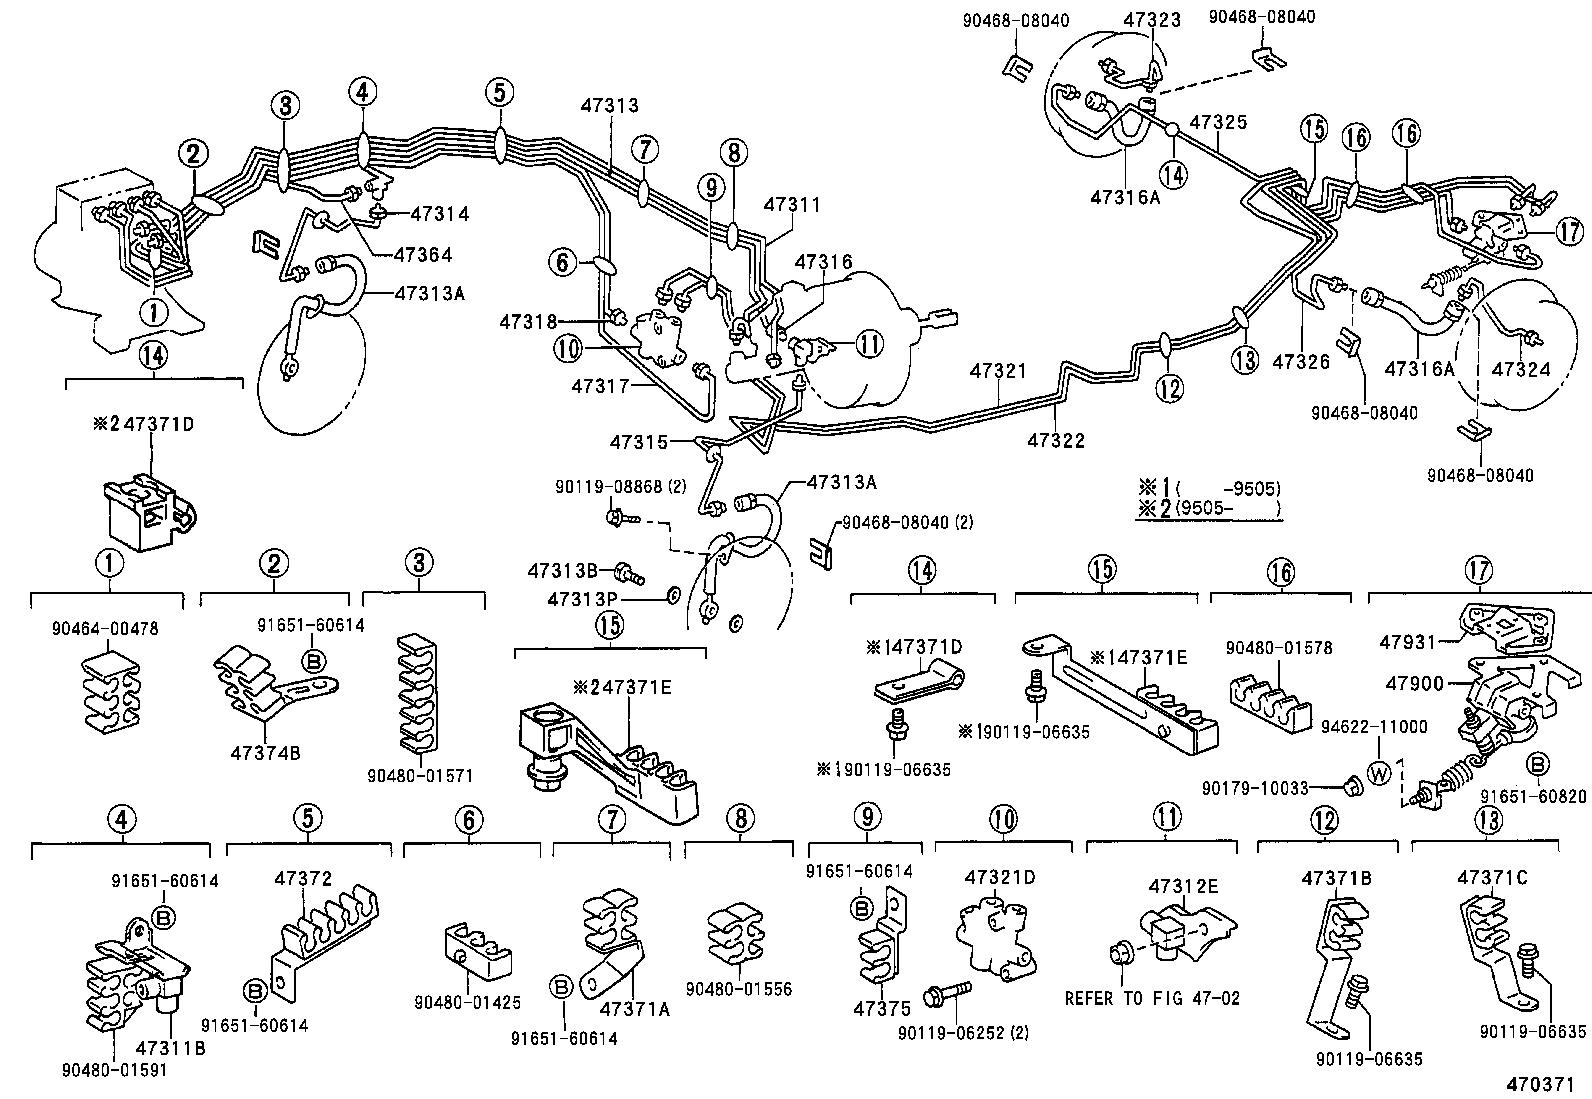 toyota corolla parts catalog pdf